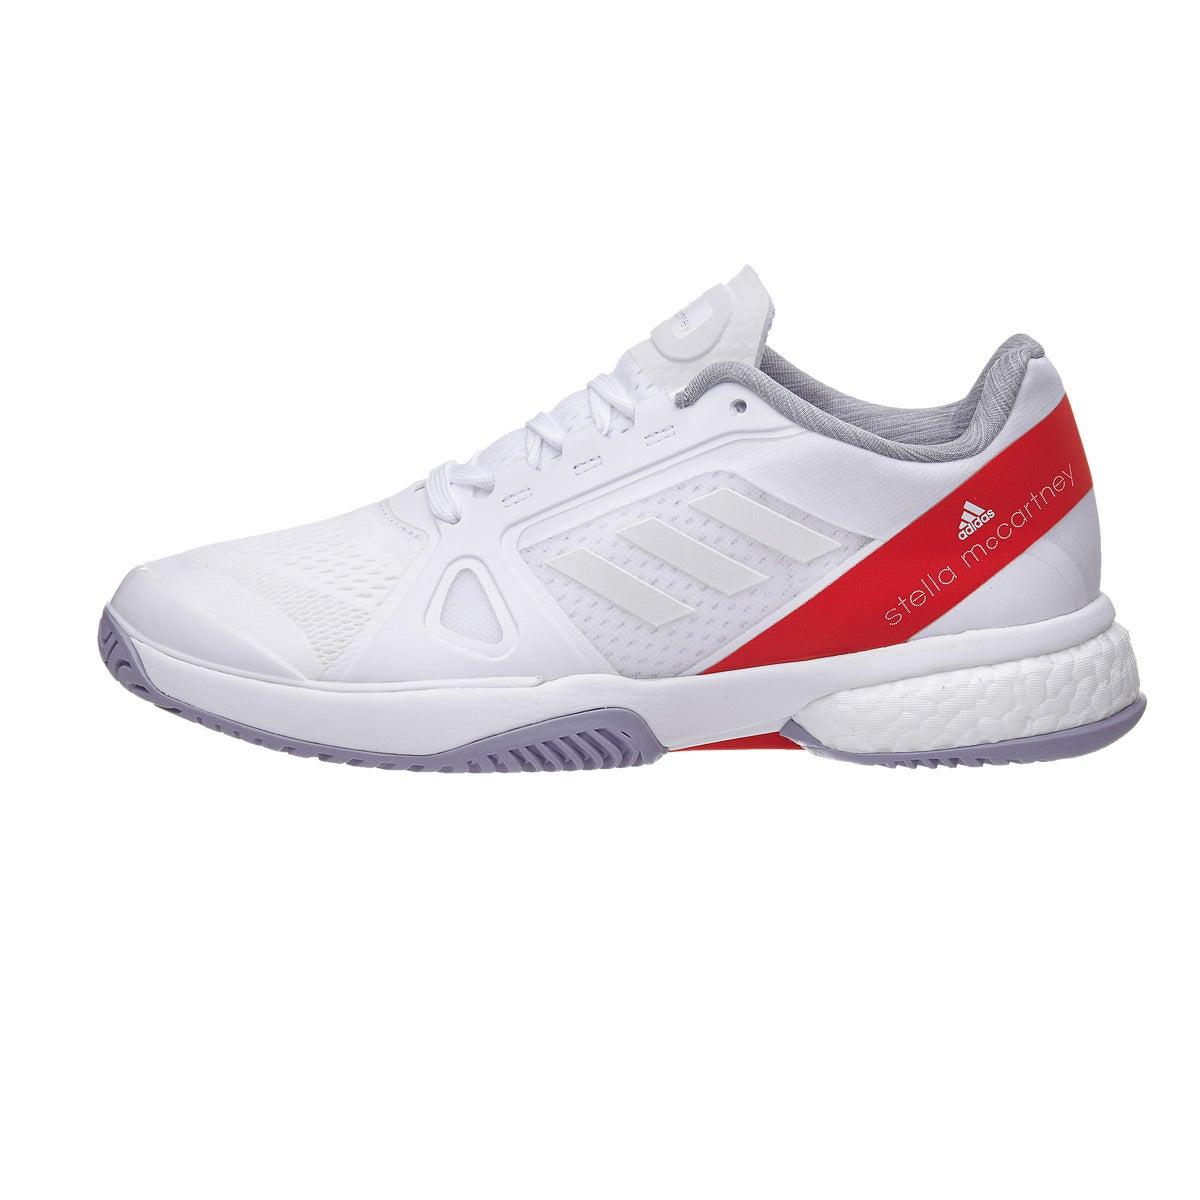 Tennis Ball Shoes